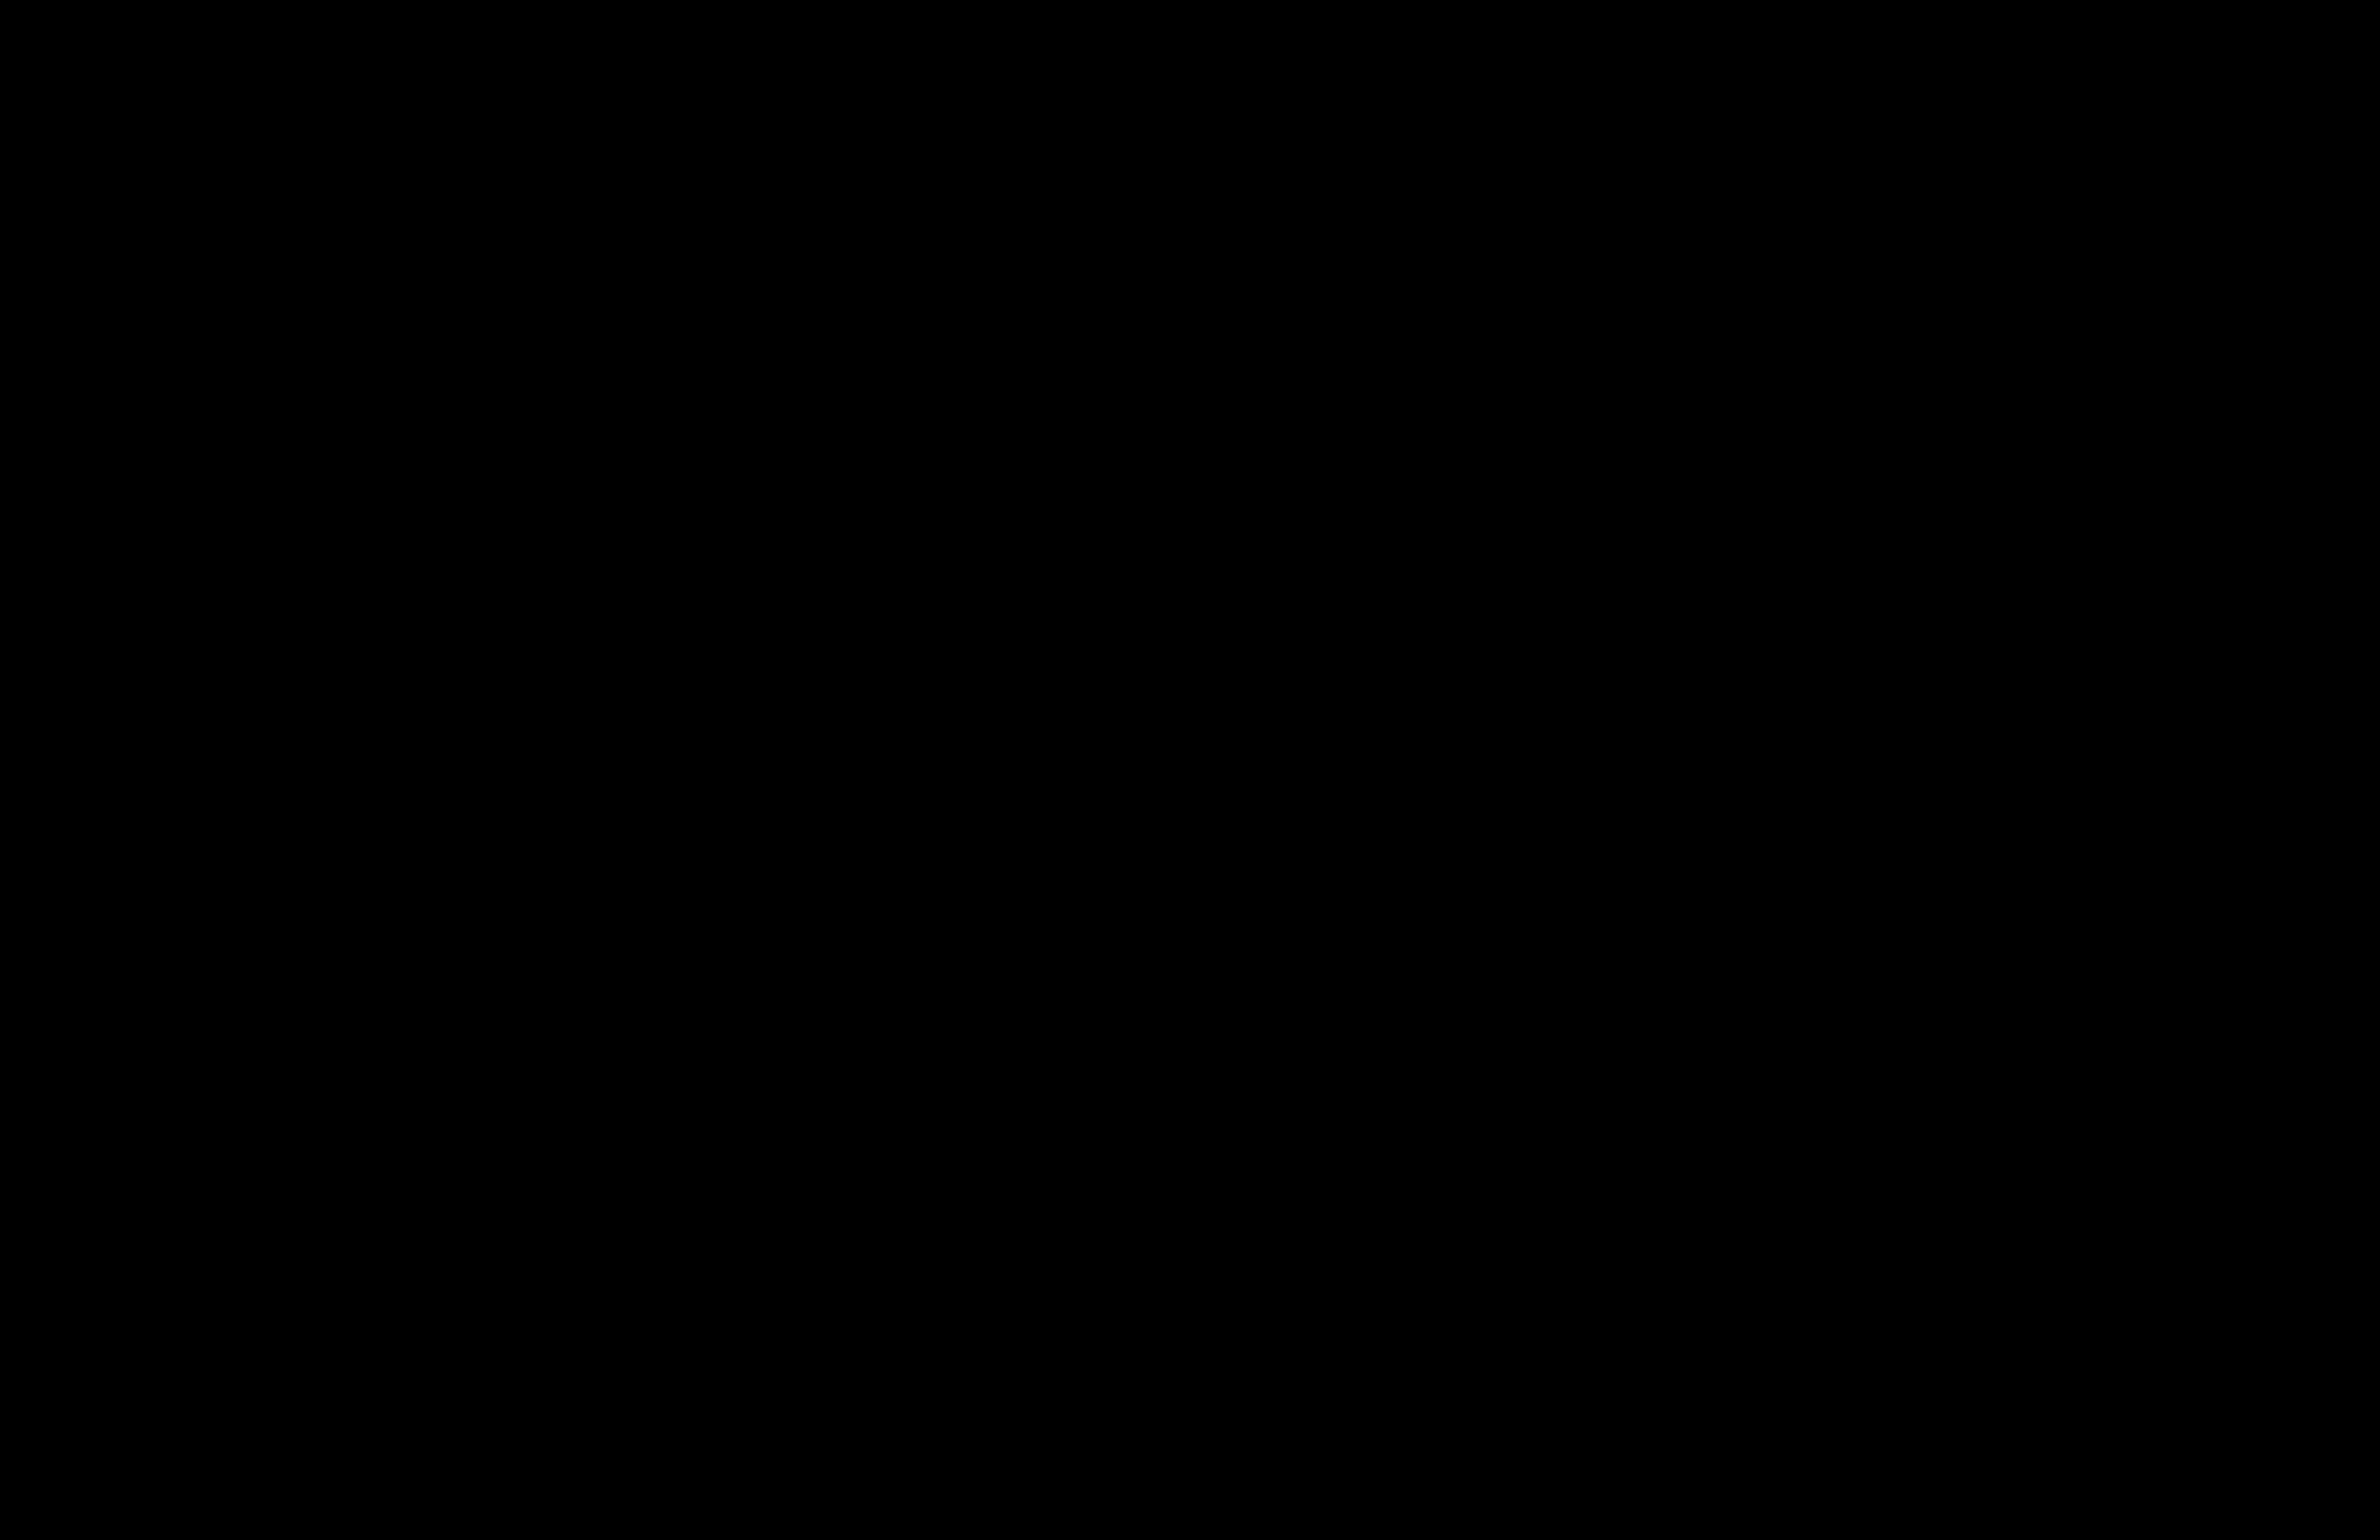 tr2237-7